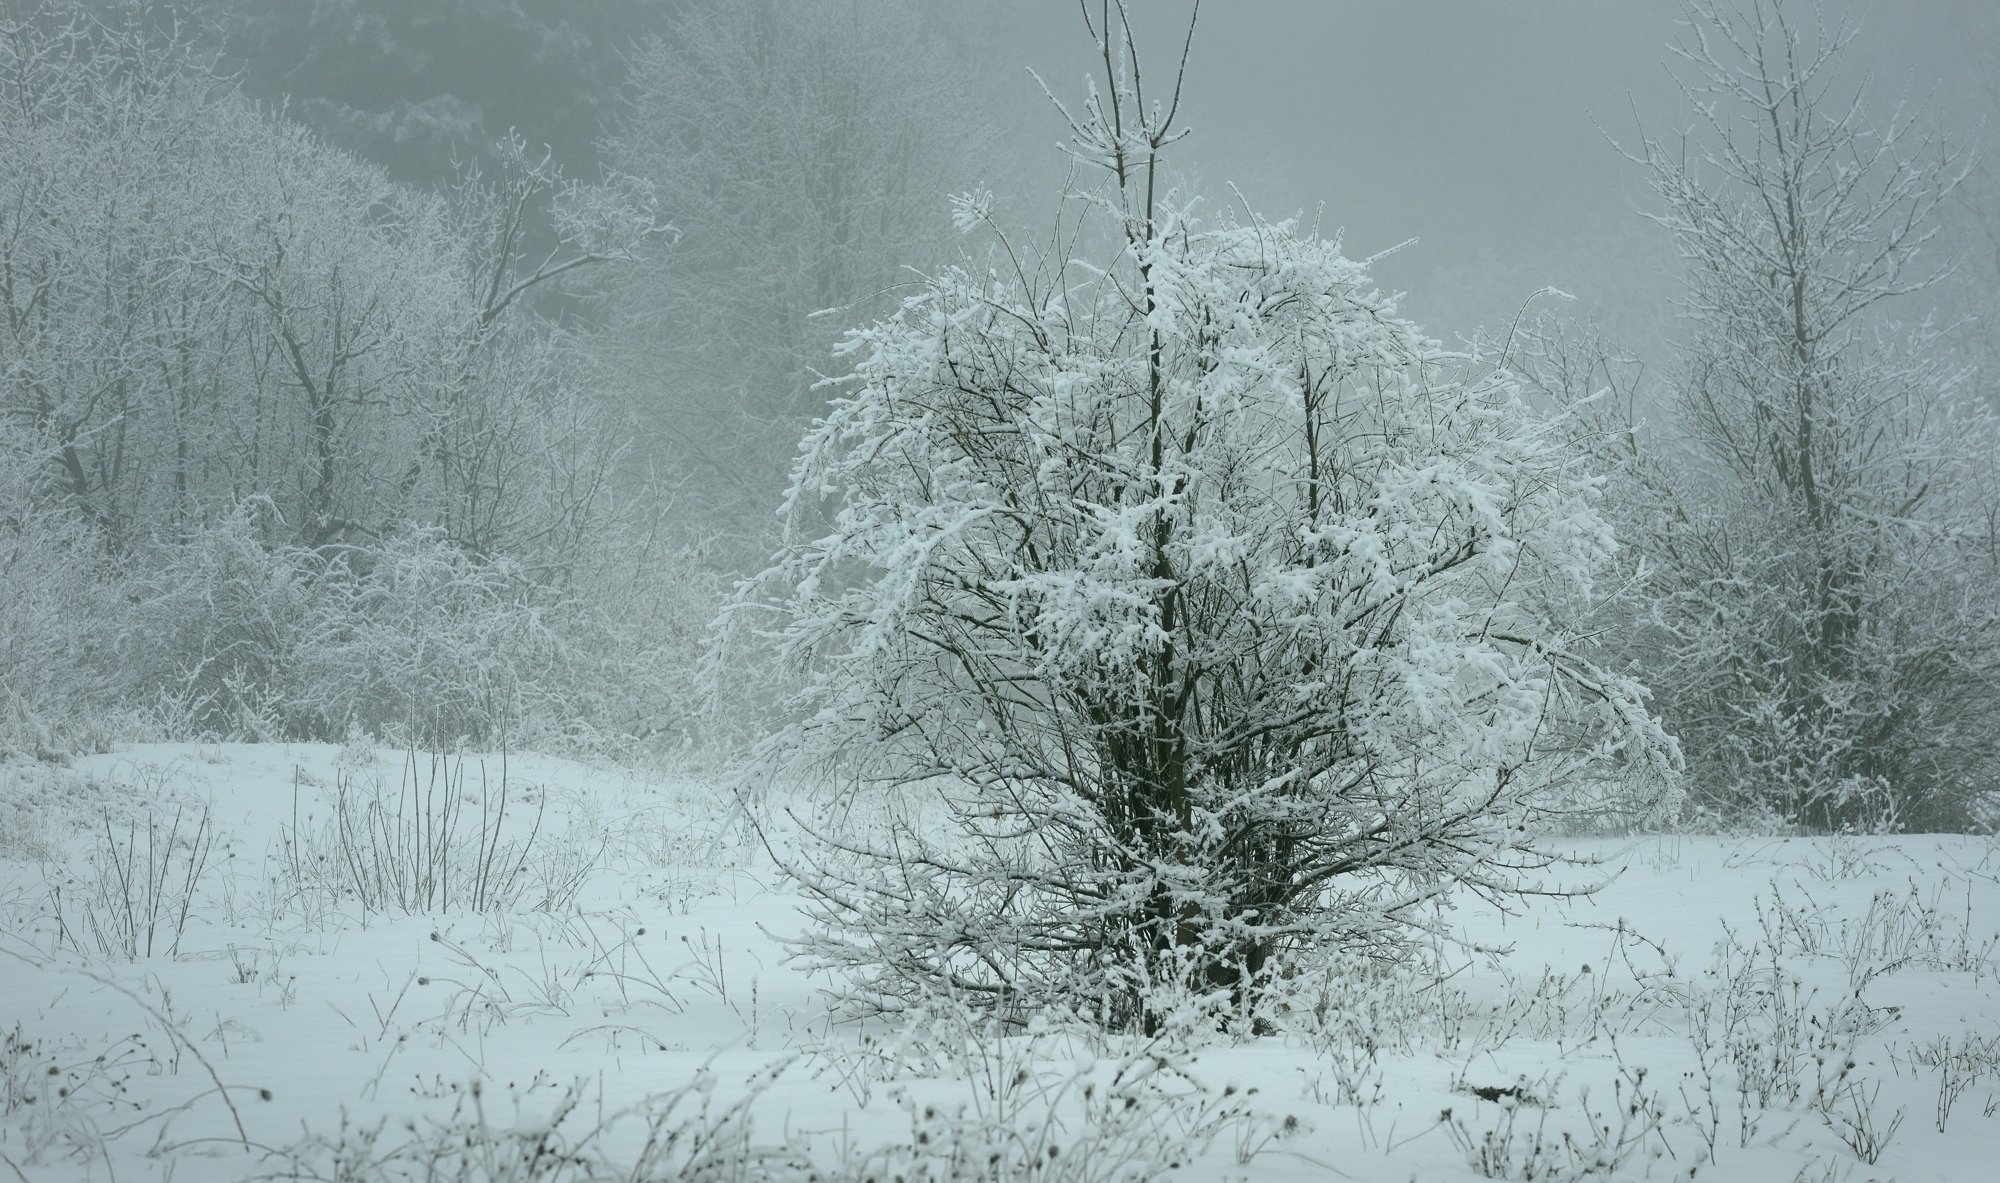 зима лес снег утро, Александр Жарников